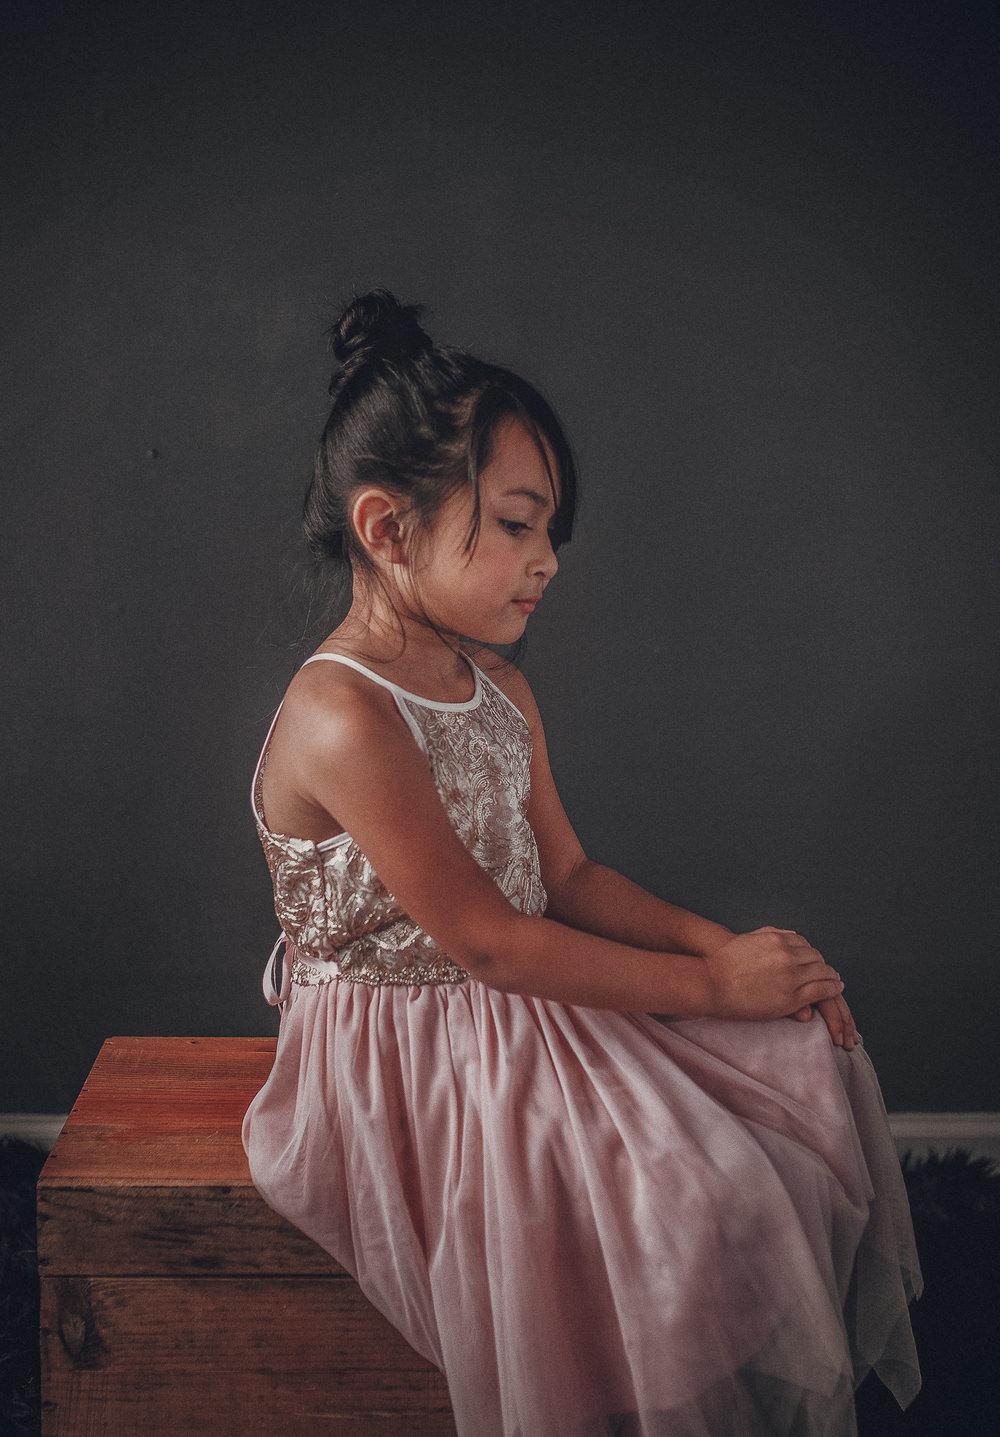 wallingford_children_portrait_photographer_2.jpg